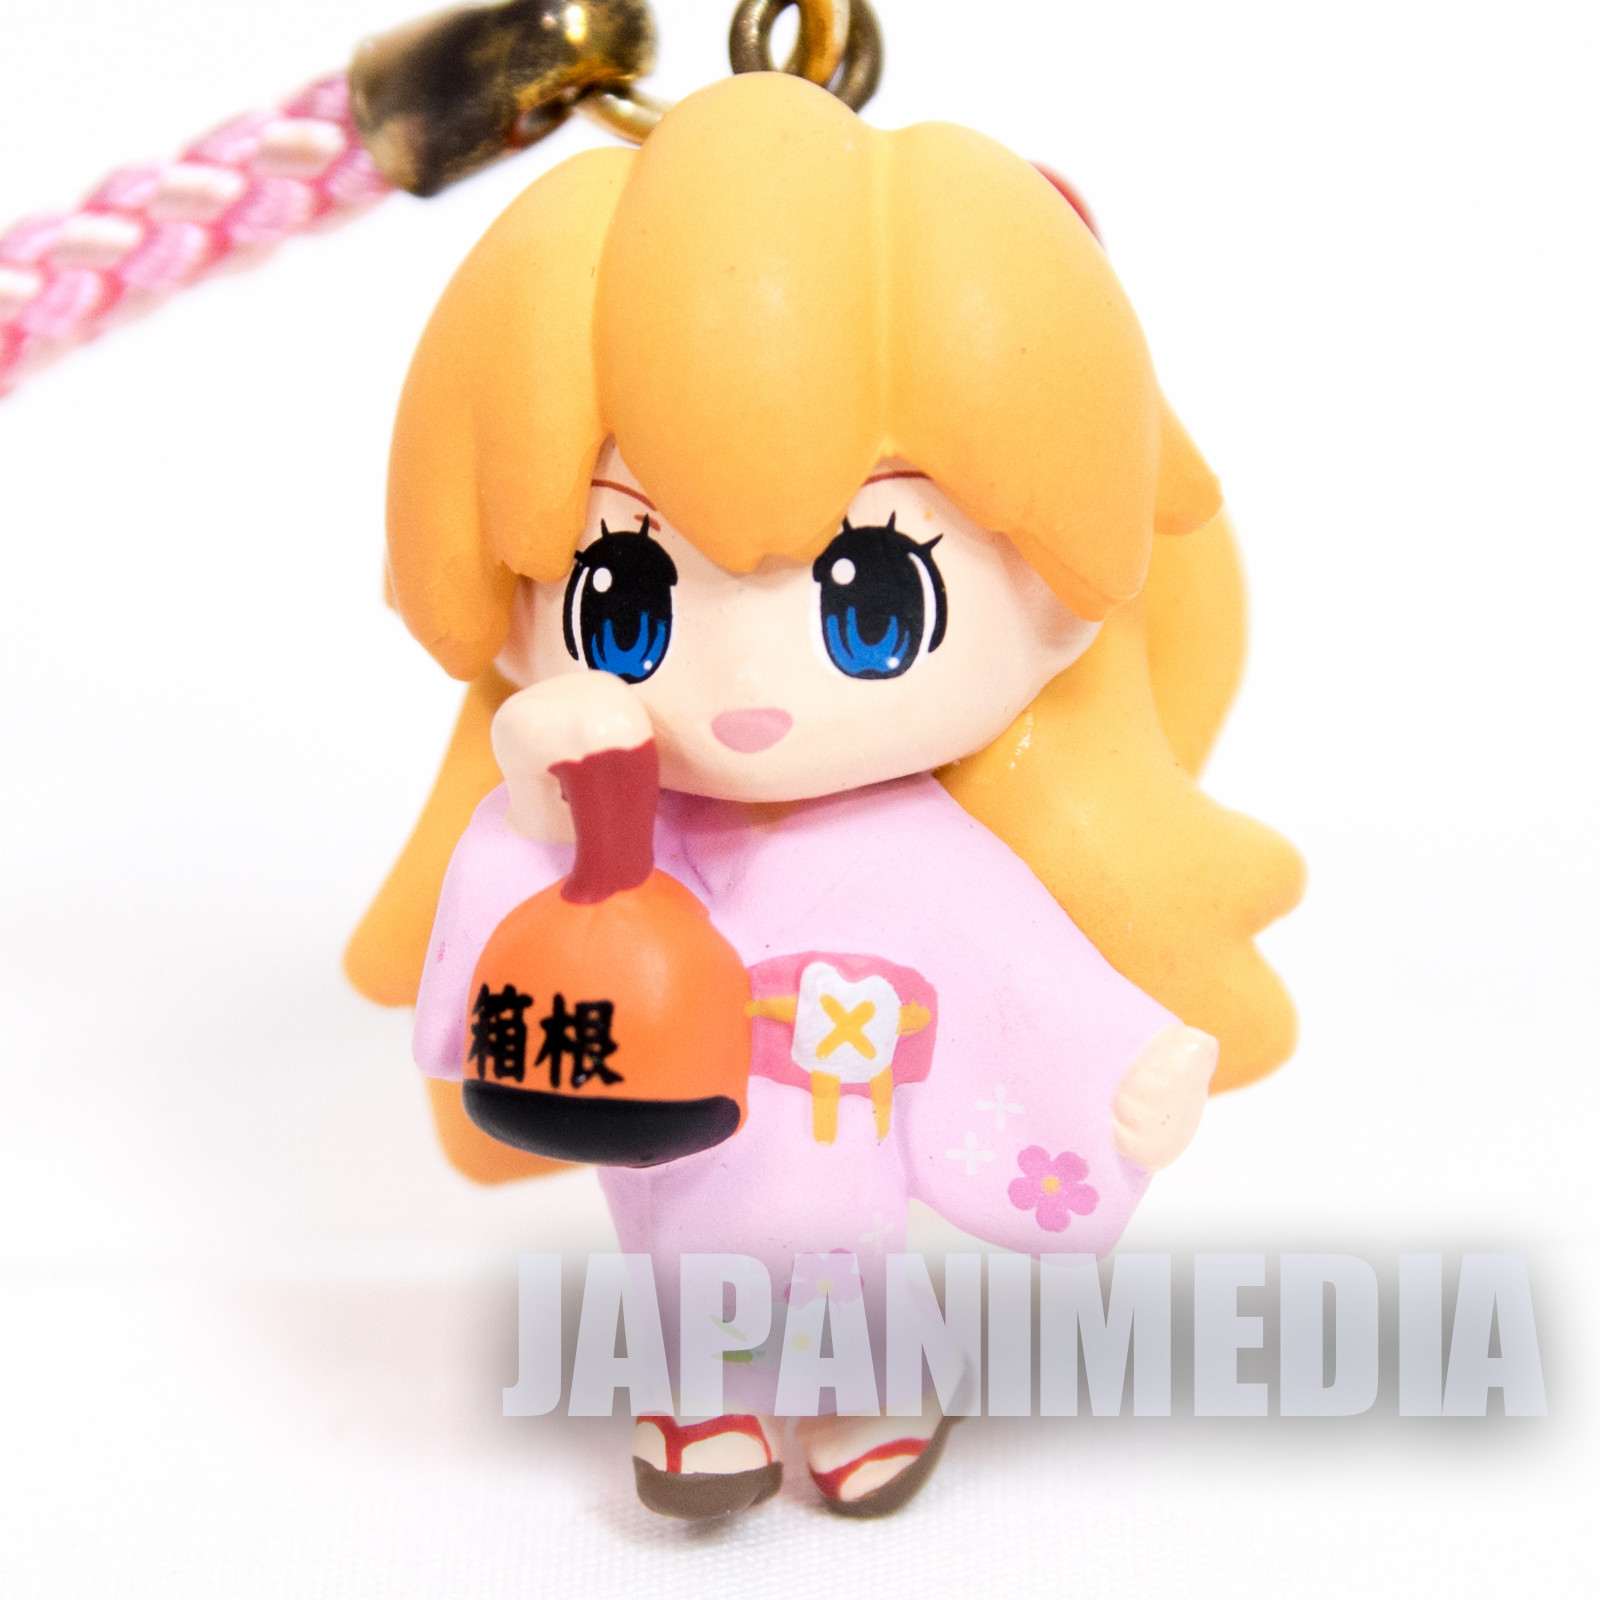 Evangelion Asuka Langley Kimono Figure Strap JAPAN ANIME